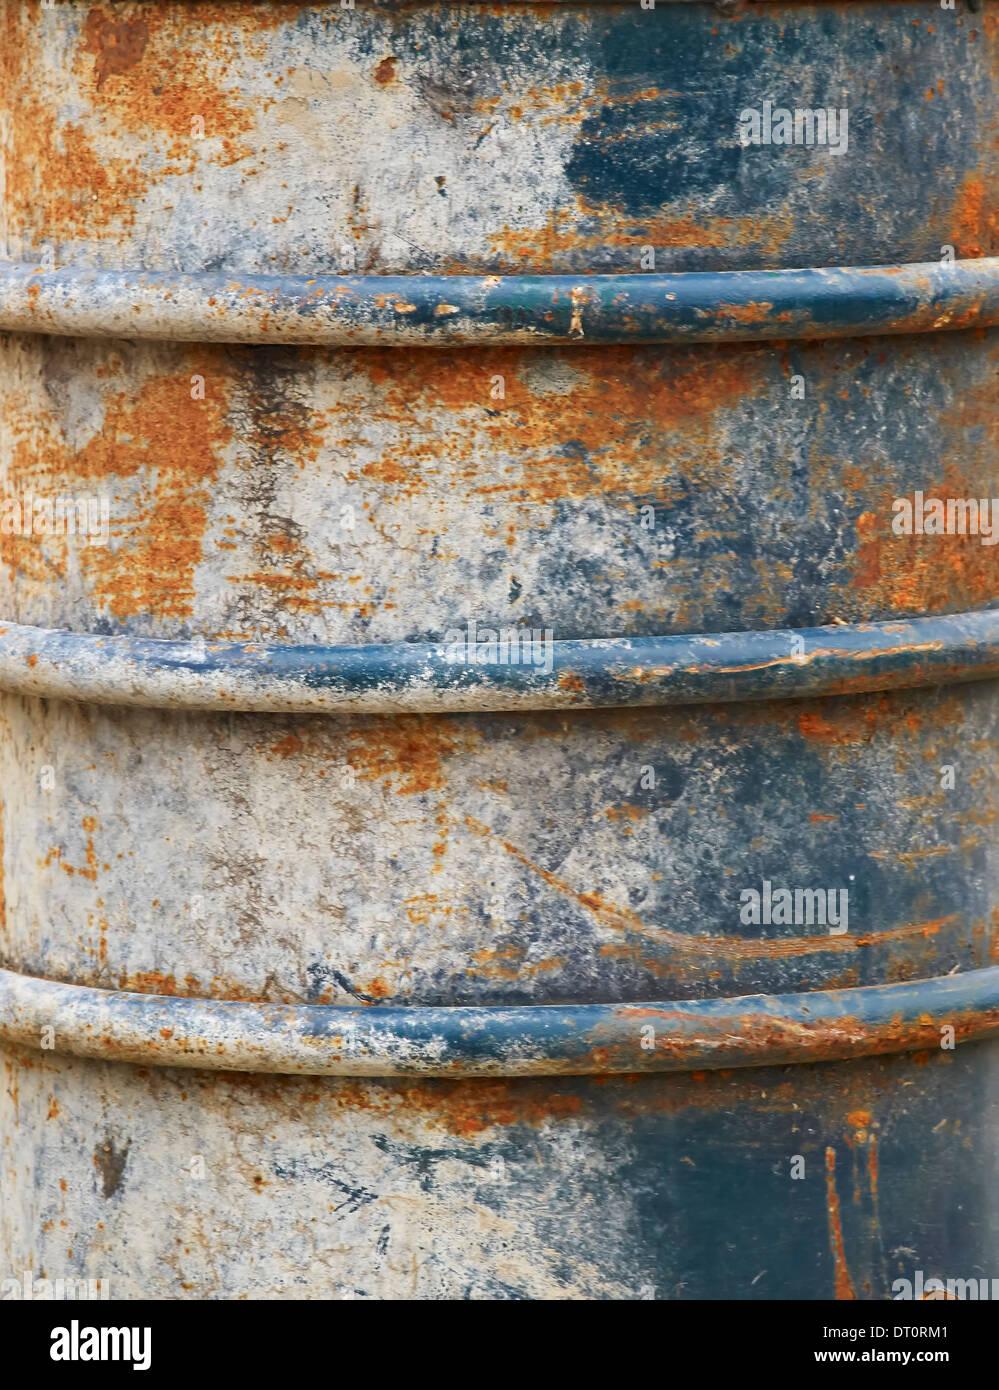 old metal garbage can - Stock Image